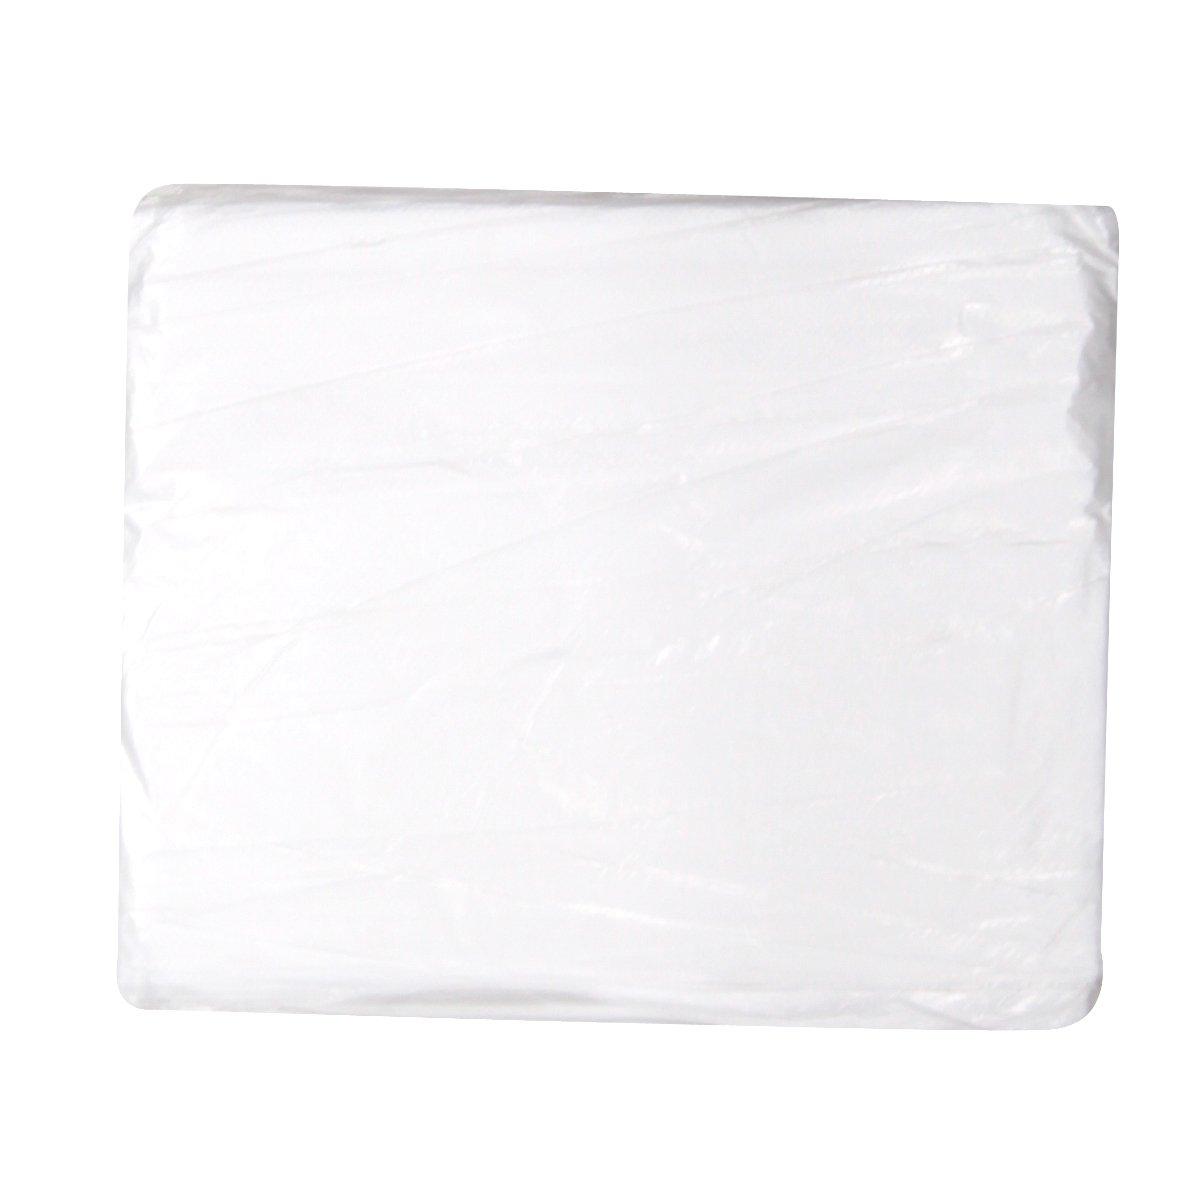 Trimaco 03306 SuperTuff Plastic Drop Cloth 10-feet x 12-feet